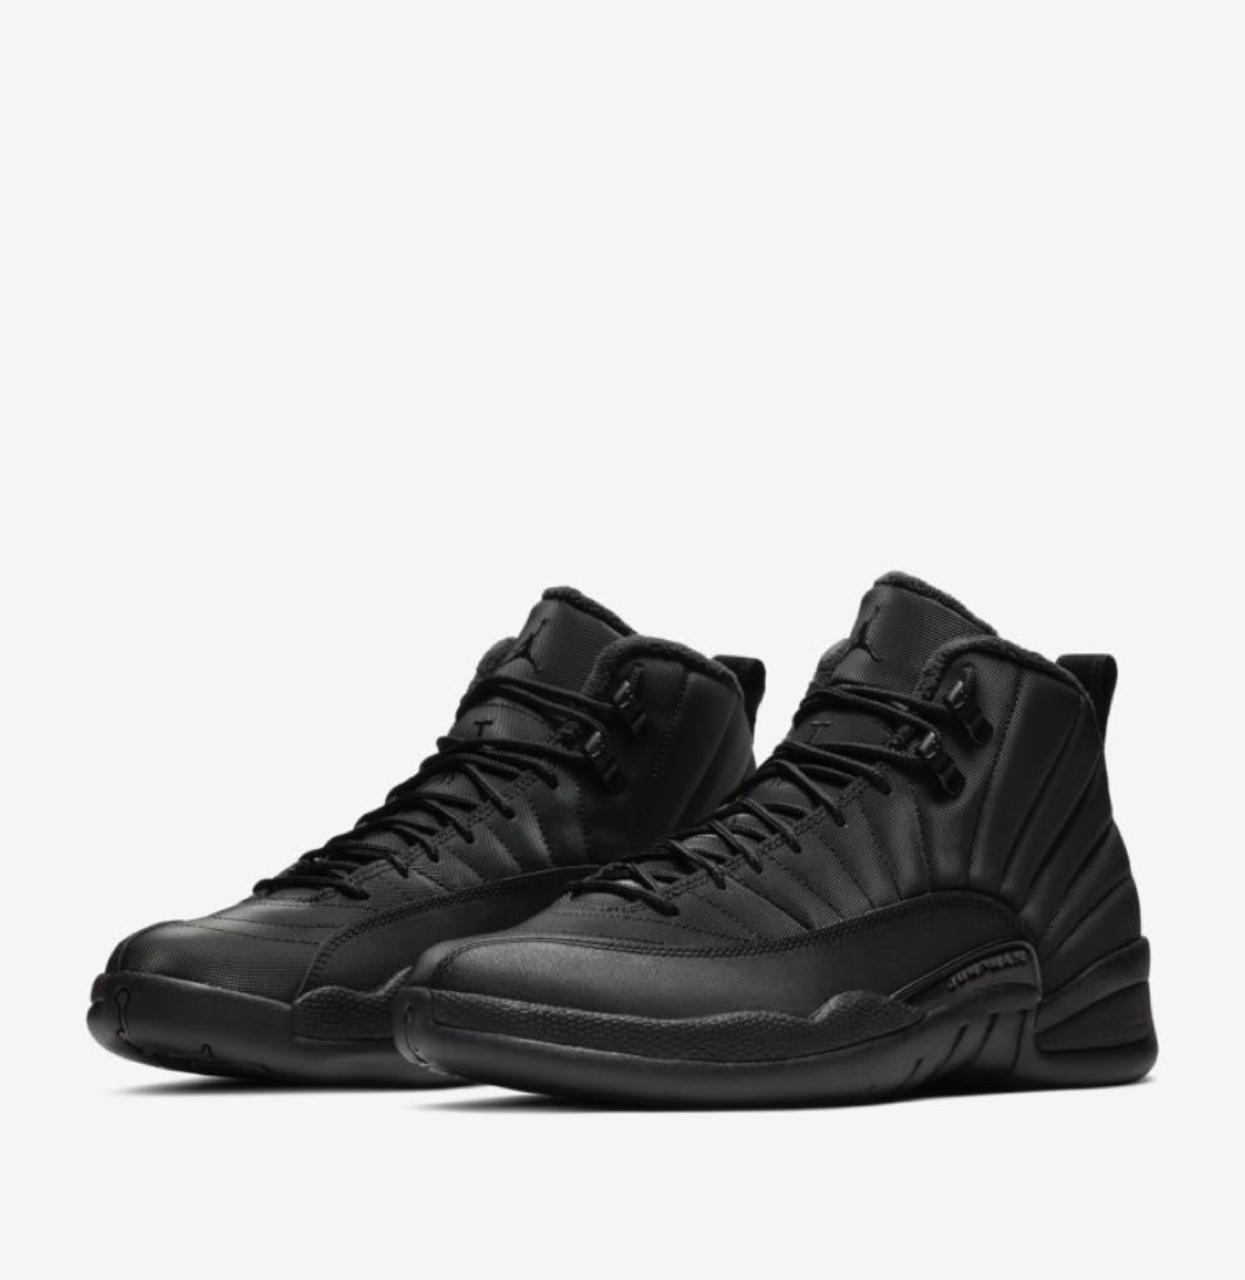 The Air Jordan 12 Gets 'Winterized